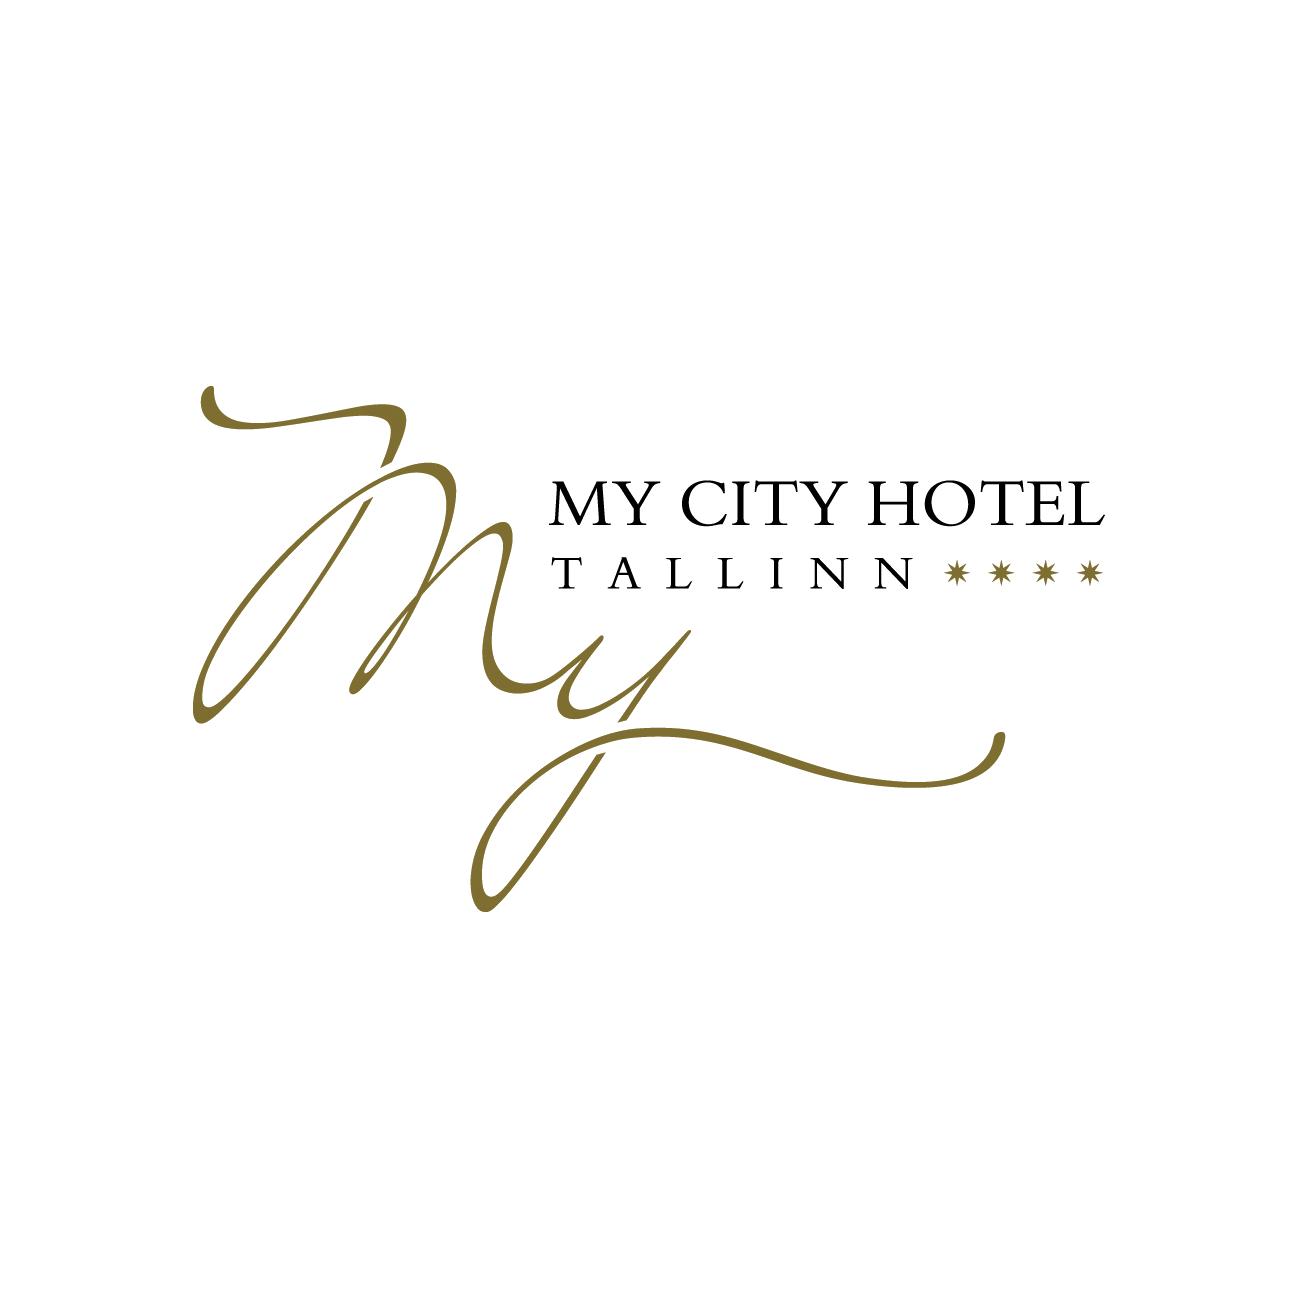 My City Hotel (My City Hotel OÜ)